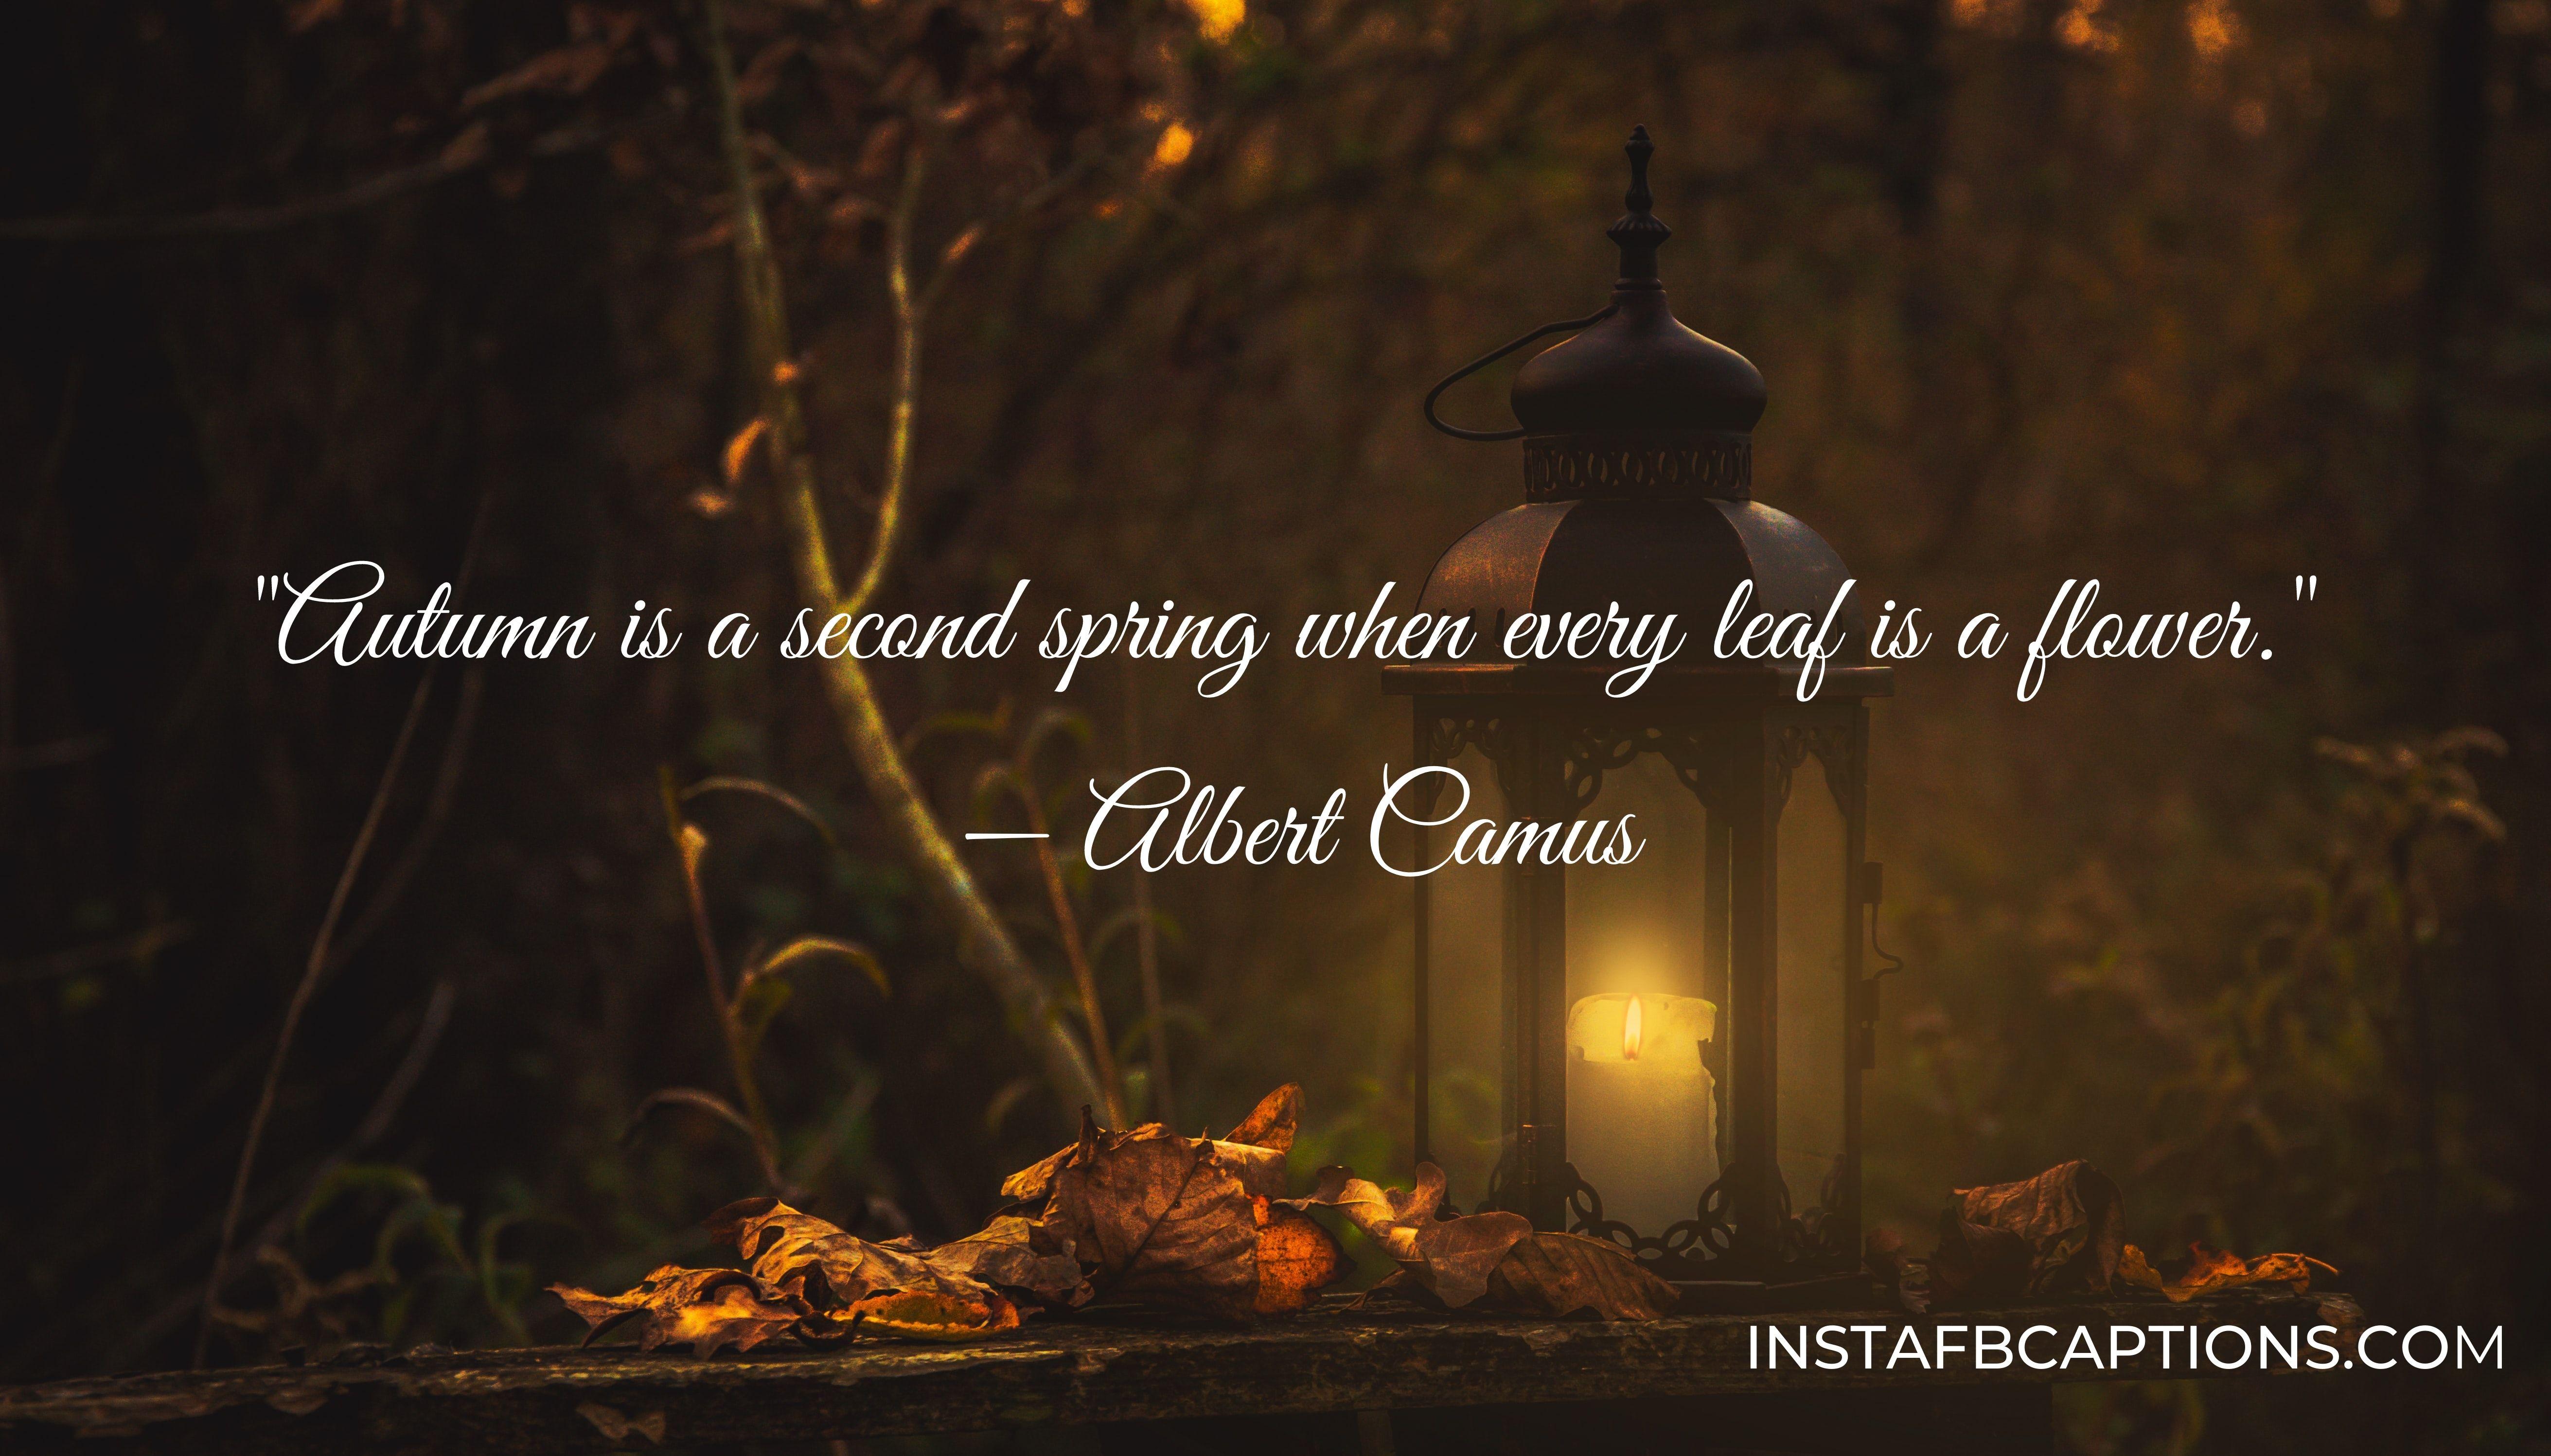 autumn inspirational quotes  - INSTAFBCAPTIONS - Autumn Fall Season Captions || (Leaf Pumpkin Selfie)